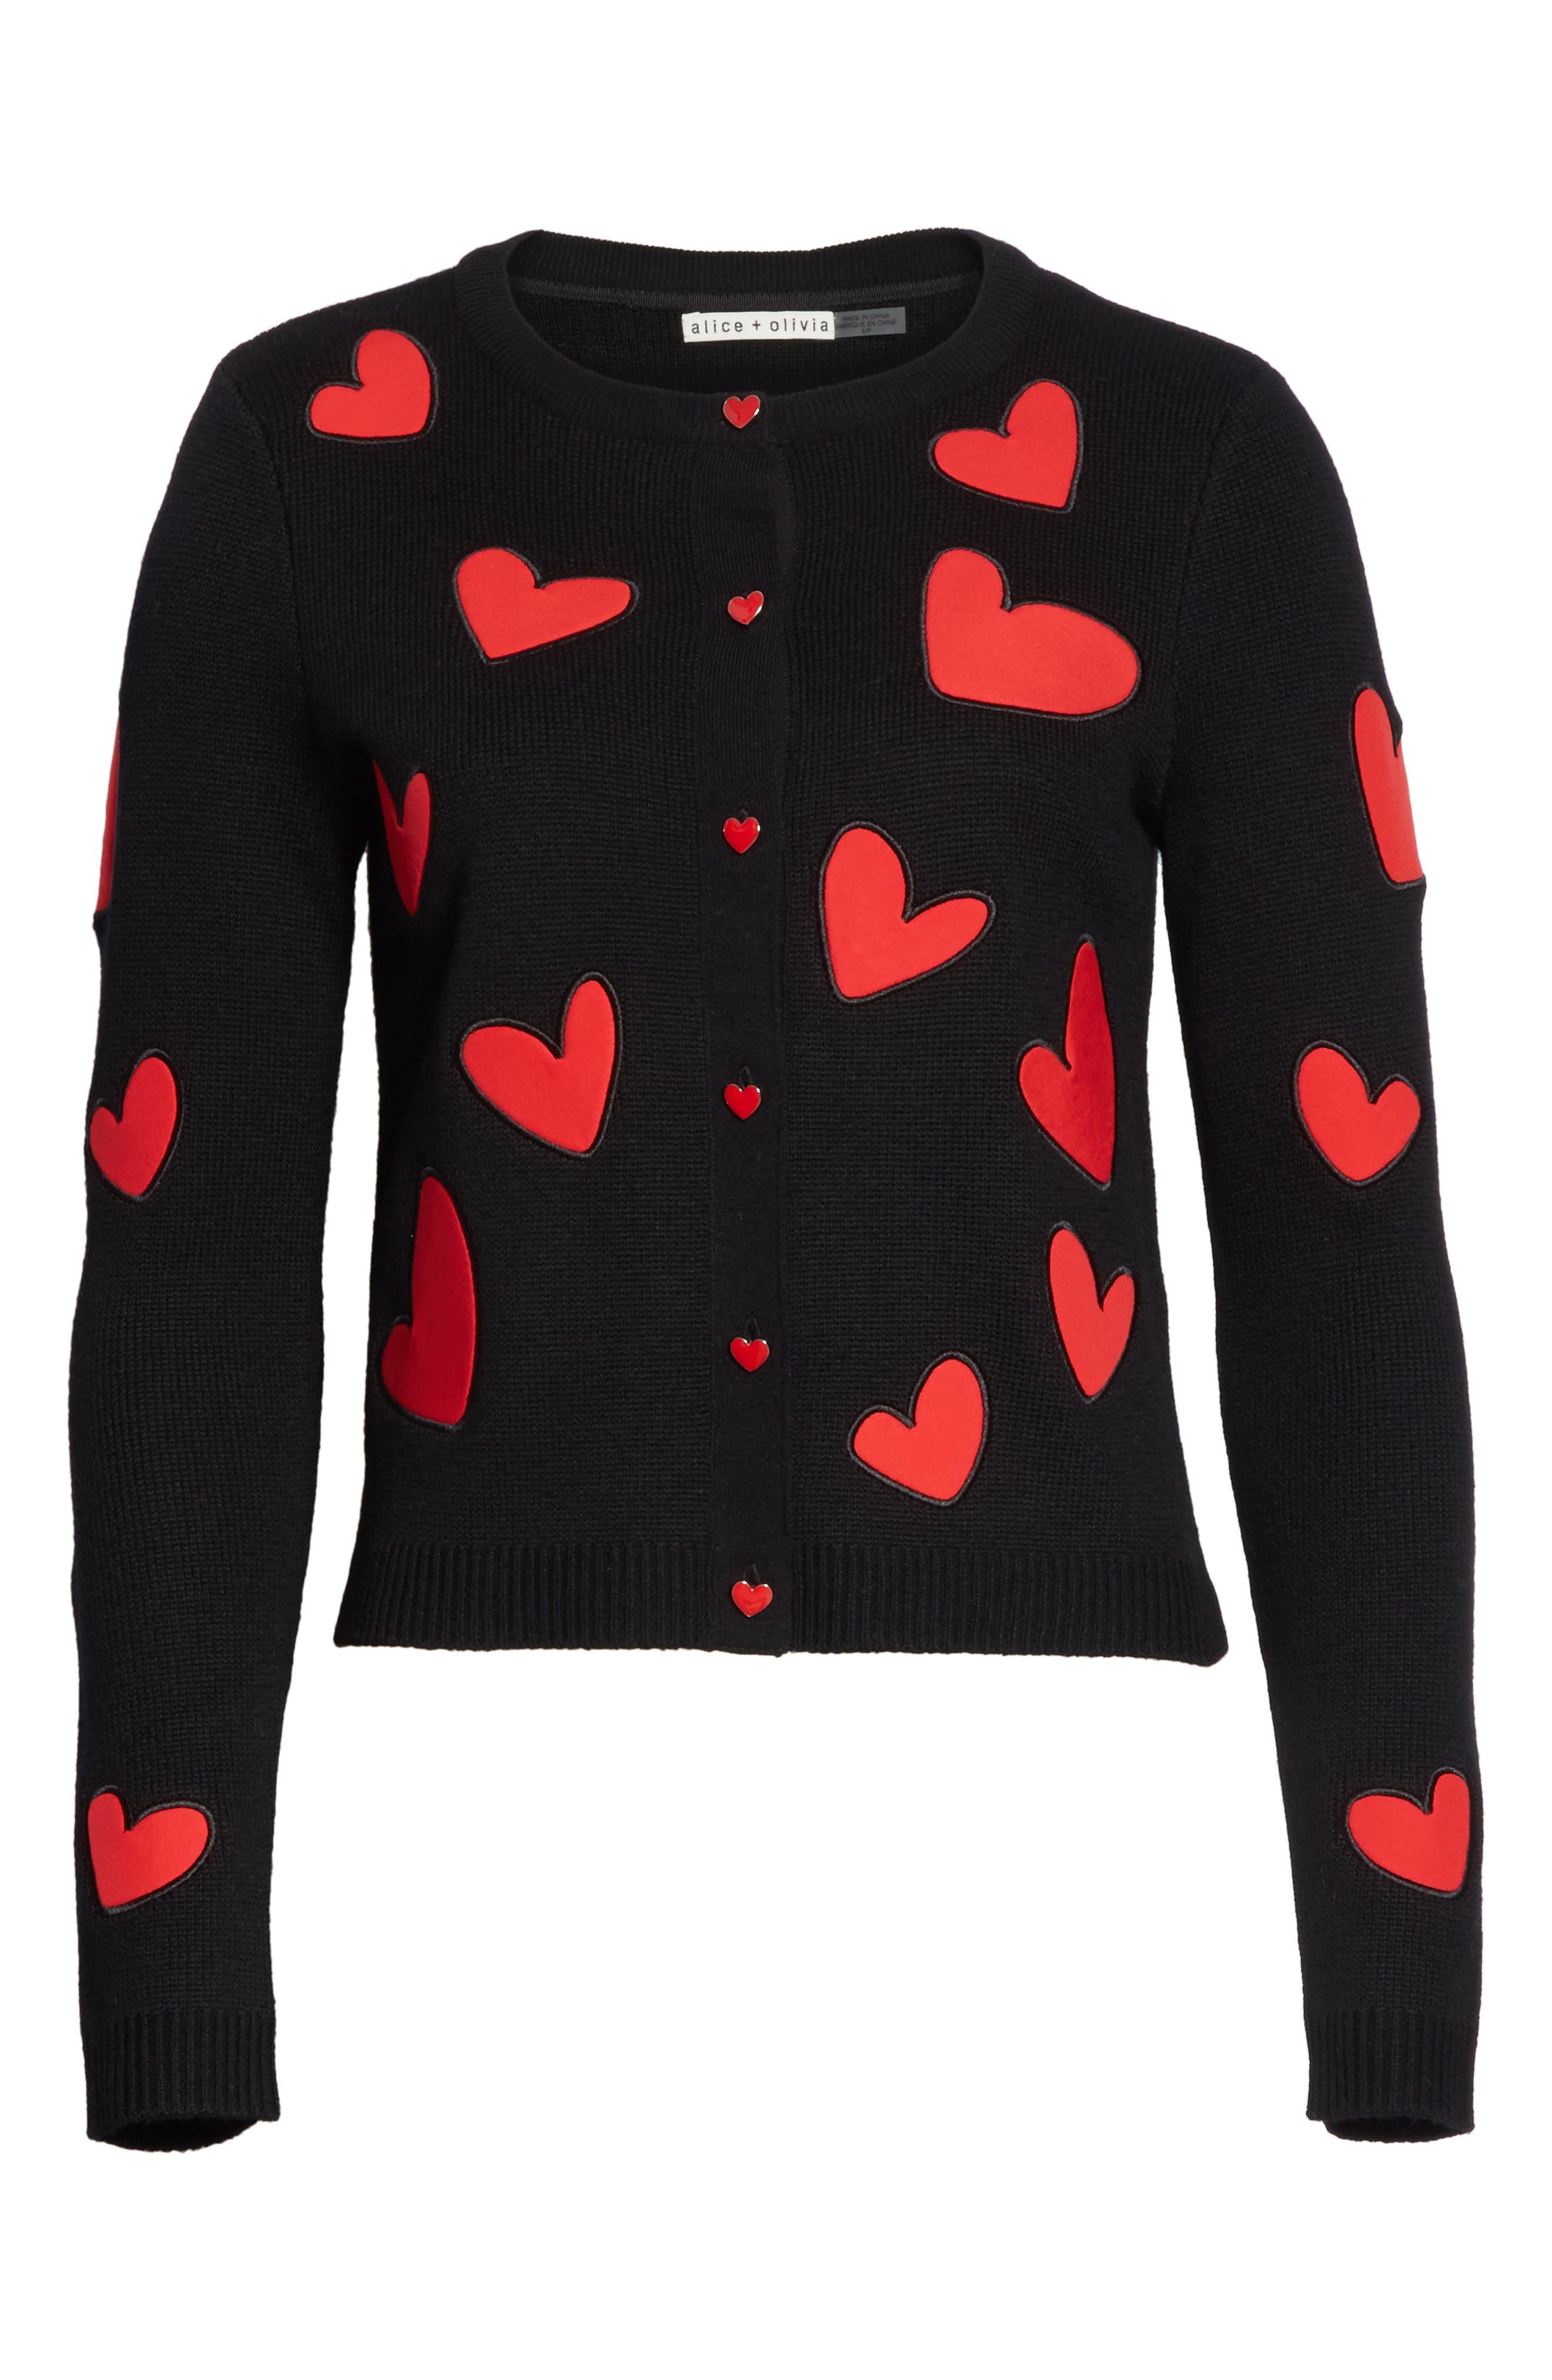 Ruthy Heart Appliqué Cardigan,                             Alternate thumbnail 6, color,                             Black/ Apple